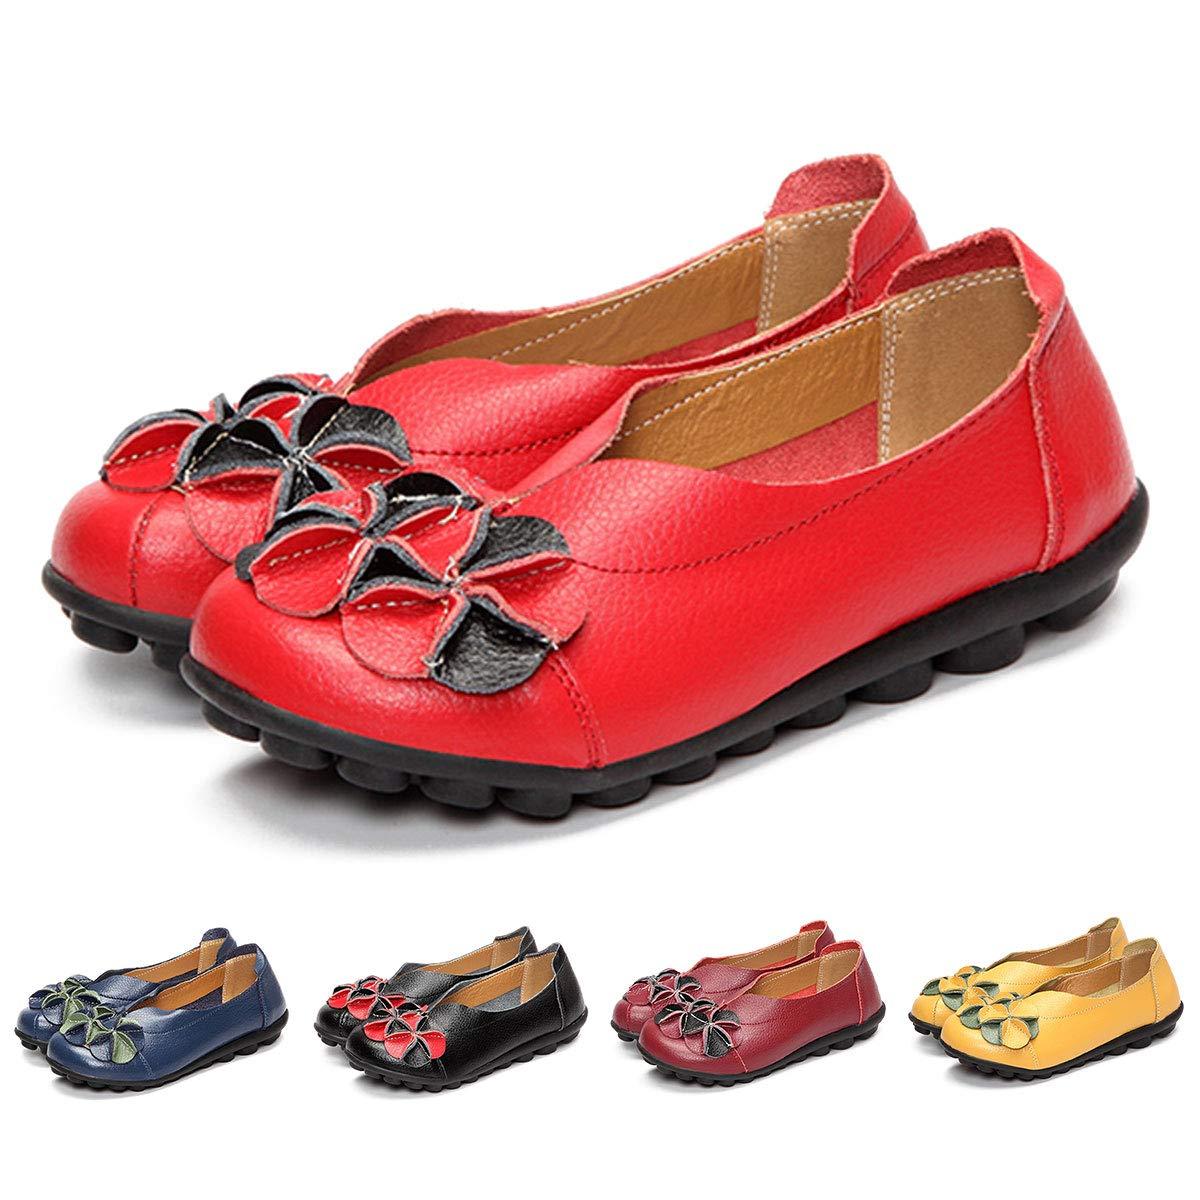 2cfb22b201f6 gracosy Women Loafer Flats